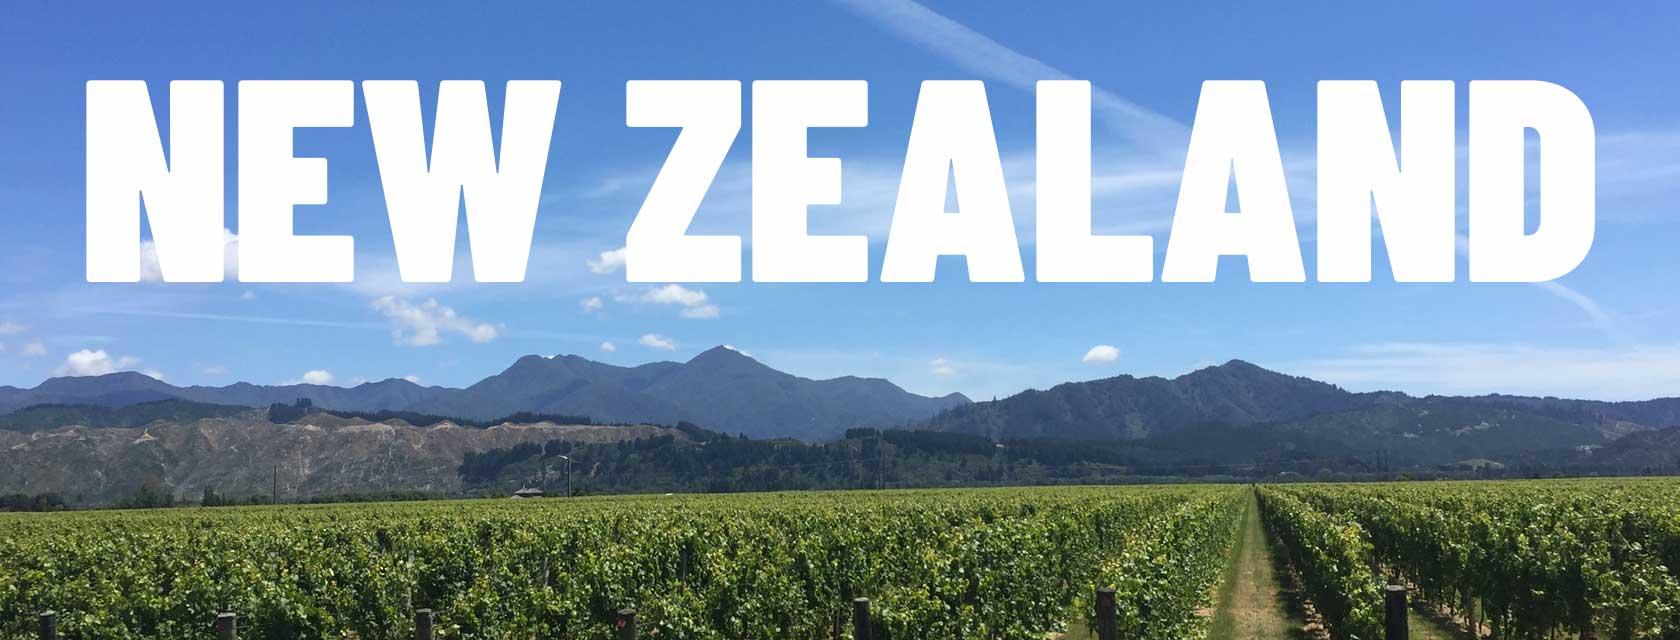 New Zealand Promo Banner Image